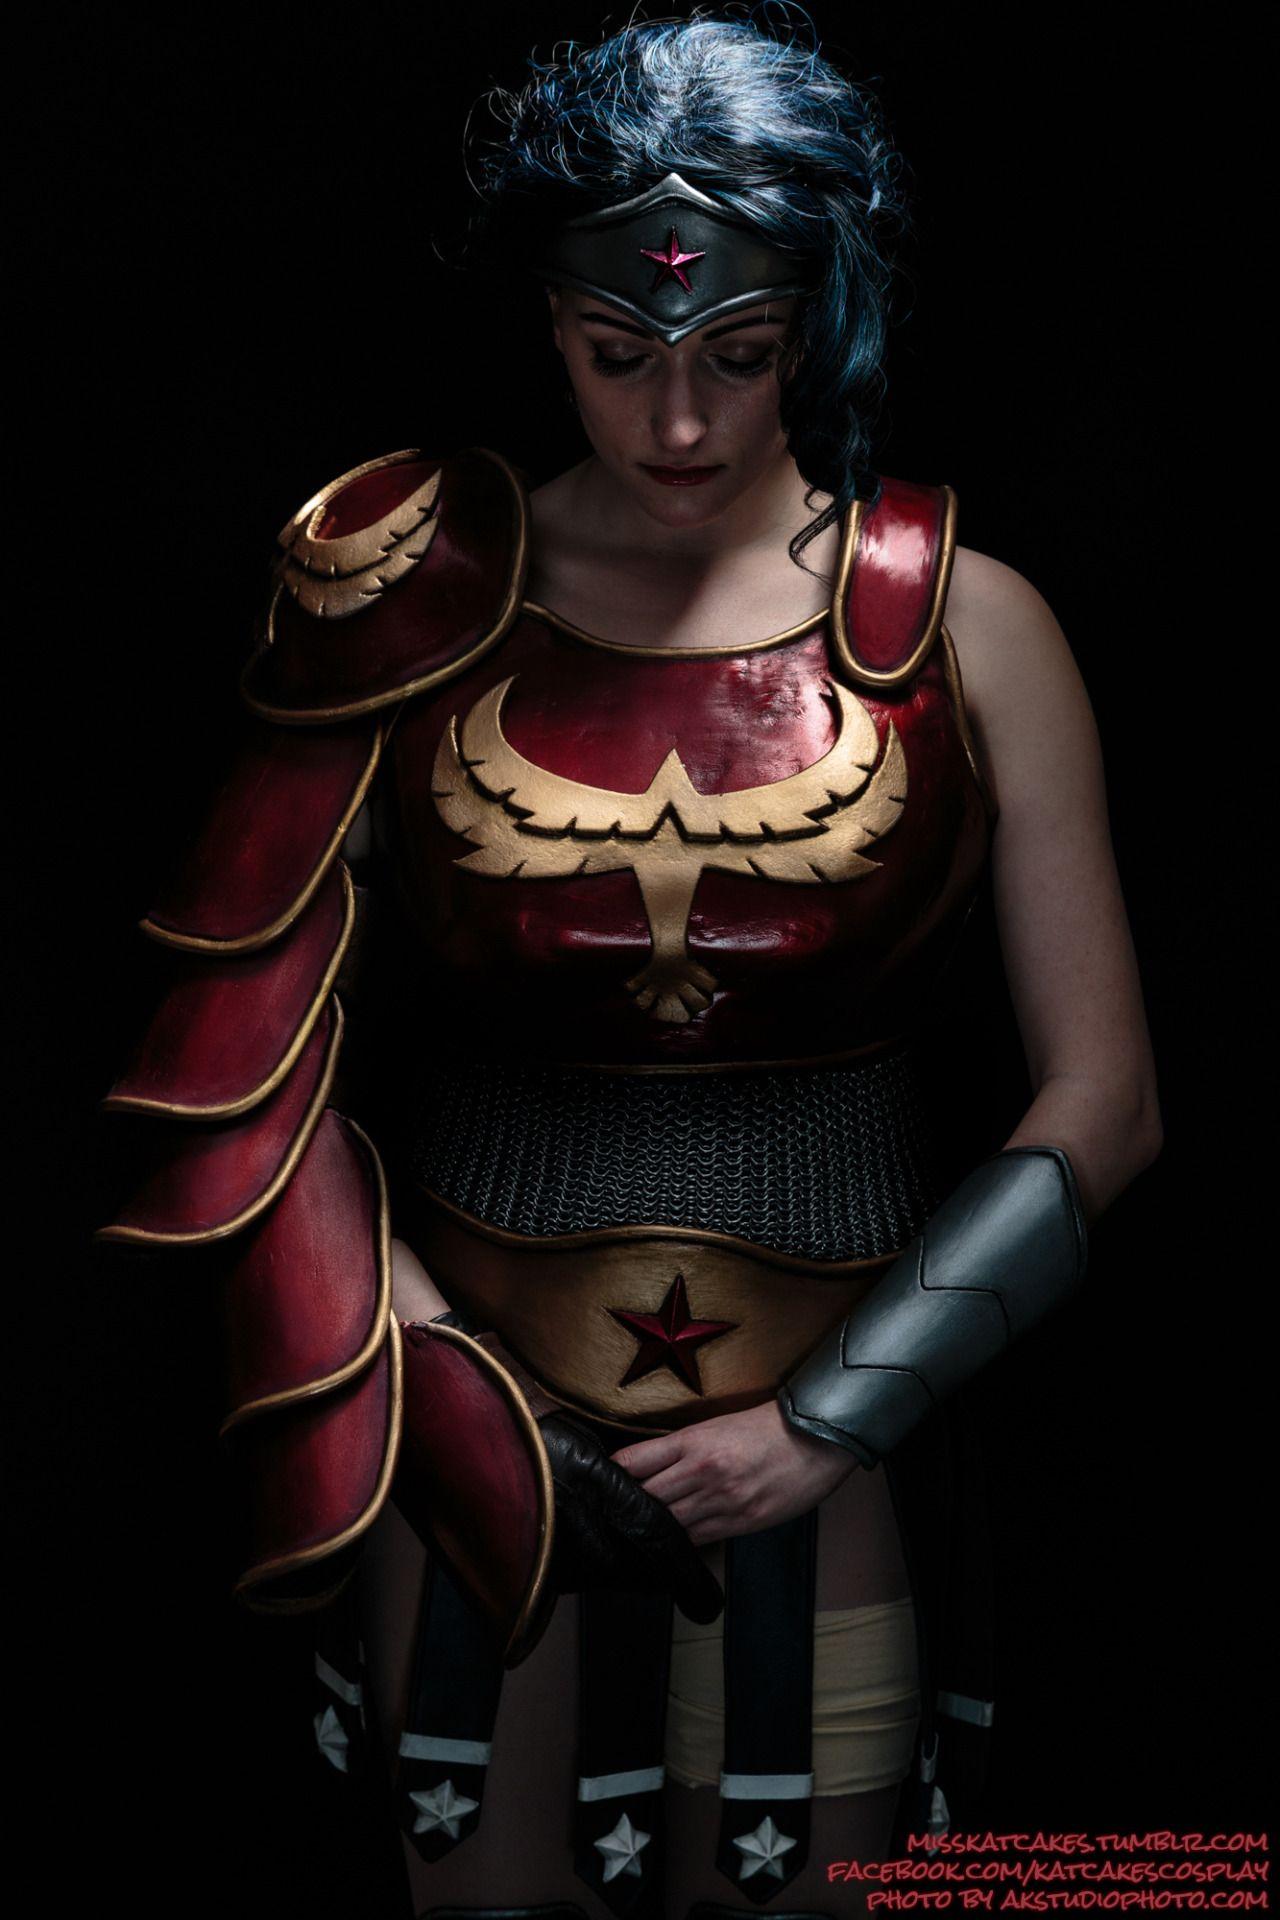 Wonder woman costume images-6577